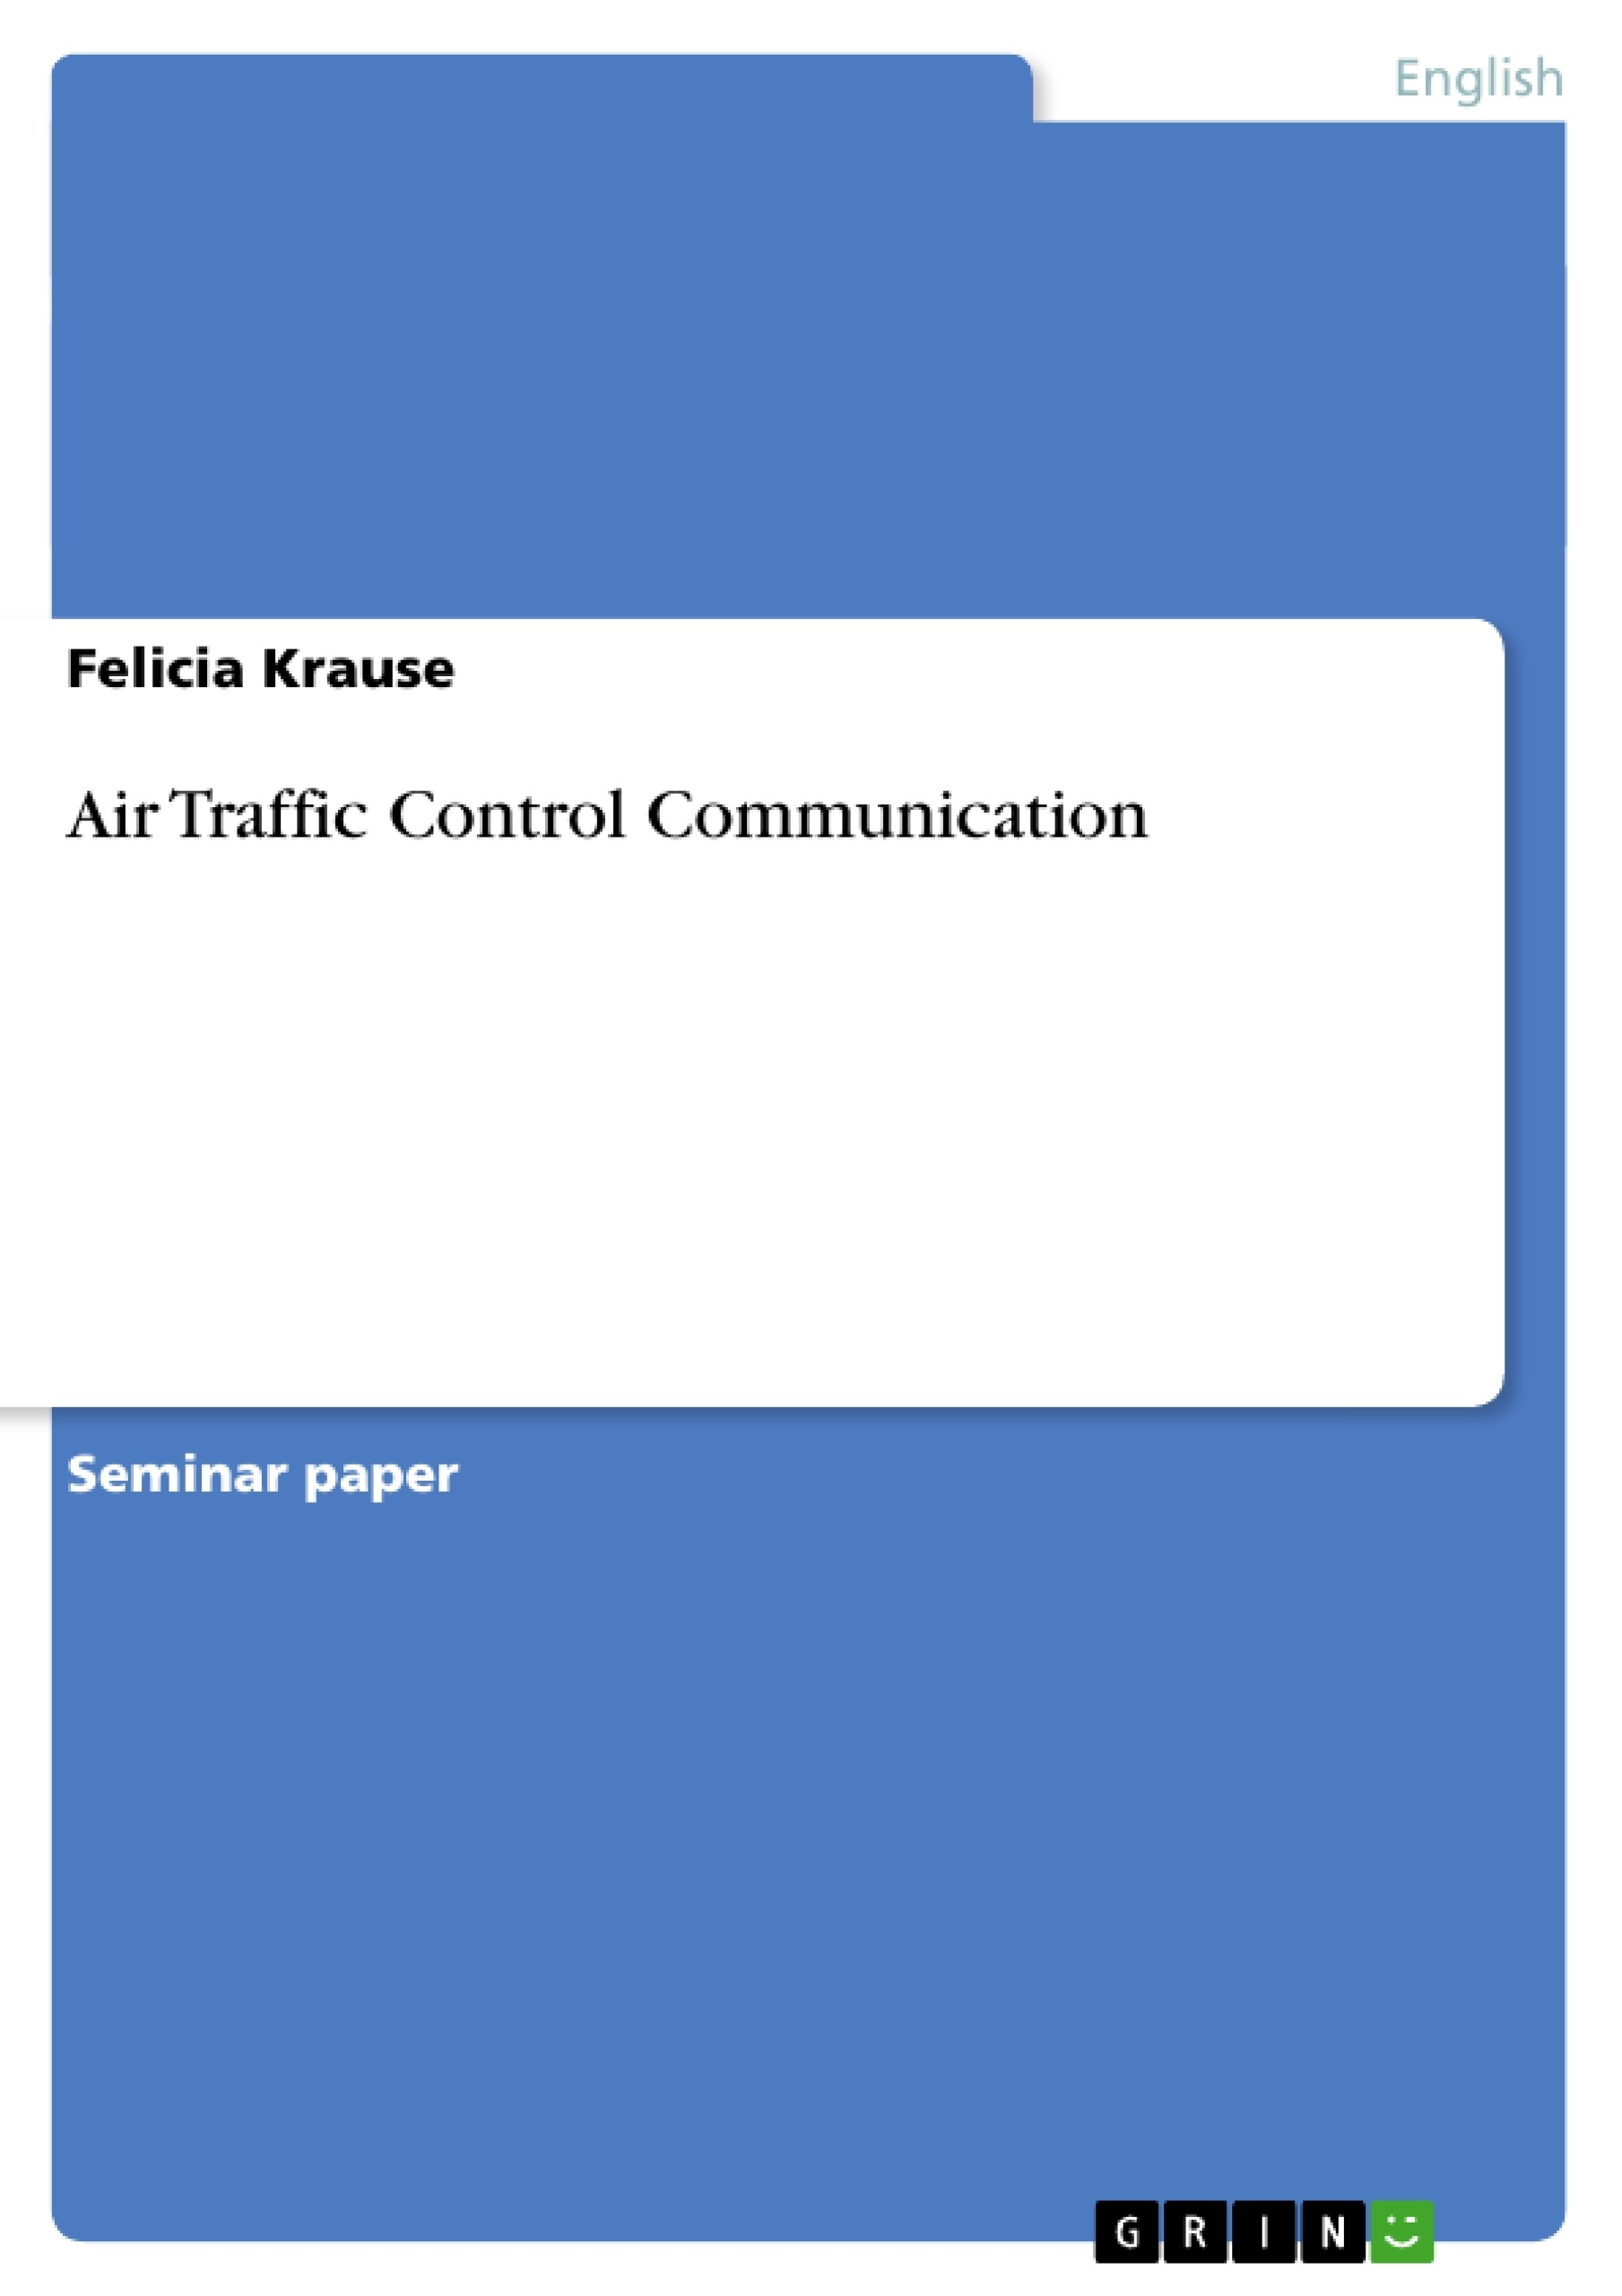 Title: Air Traffic Control Communication